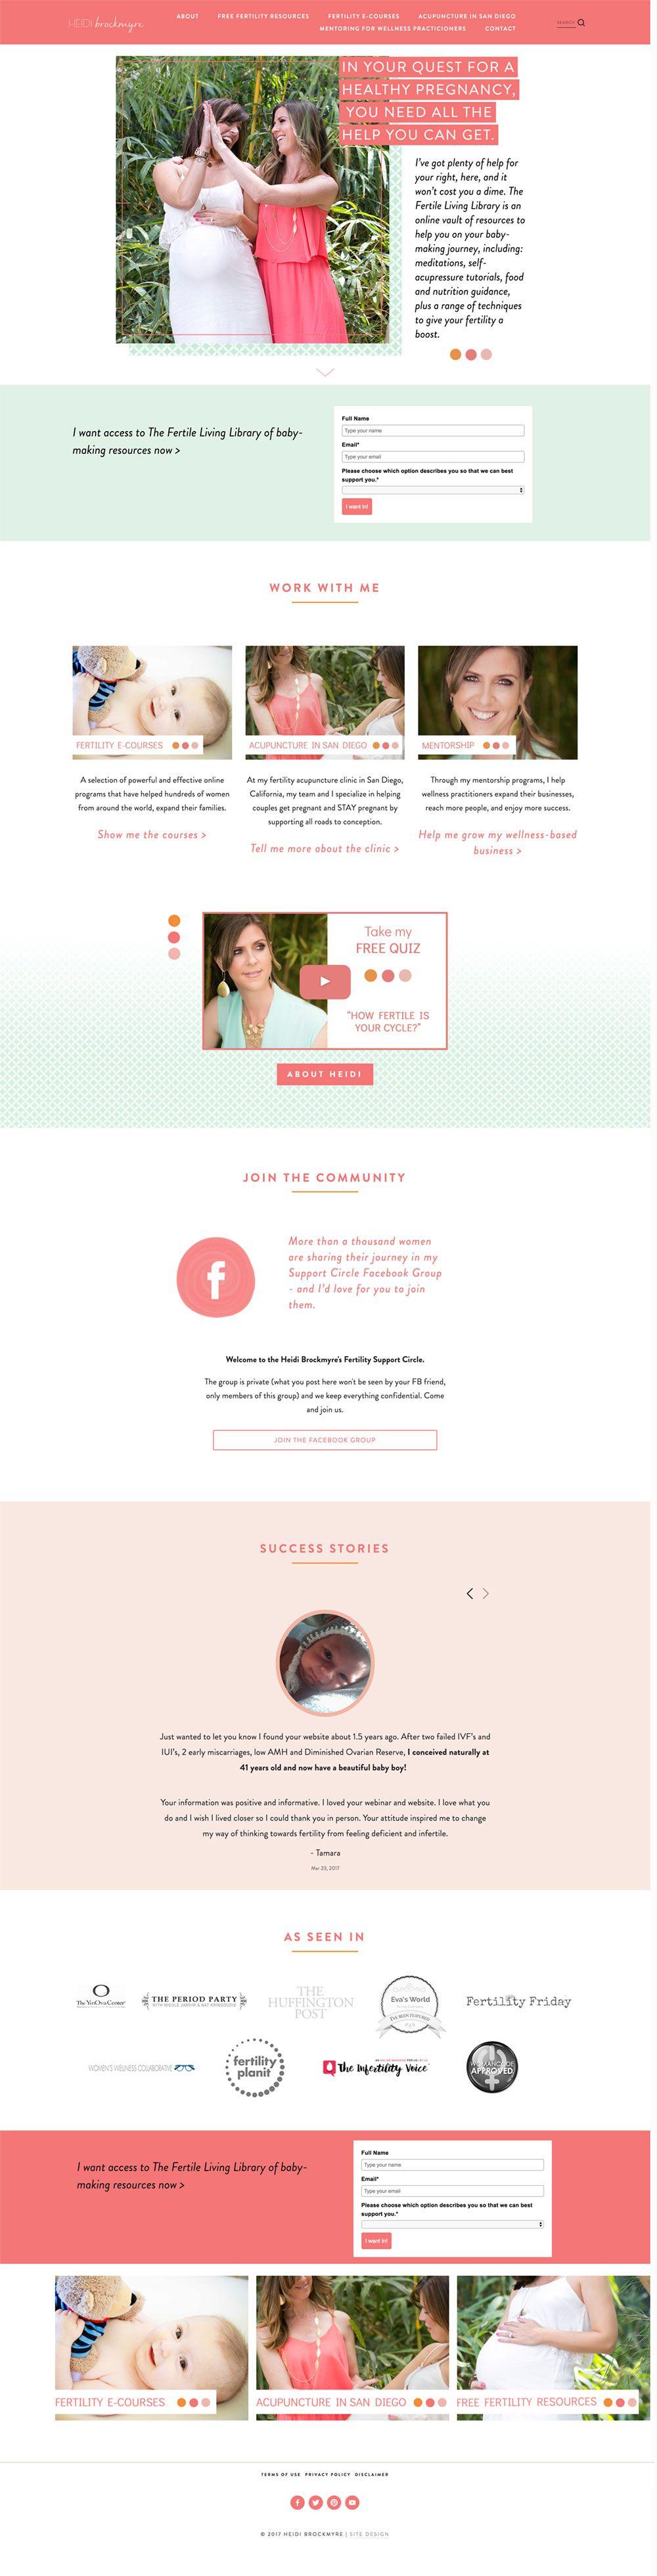 Heidi Brockmyre Website Design Blog Design Inspiration Squarespace Web Design Squarespace Design